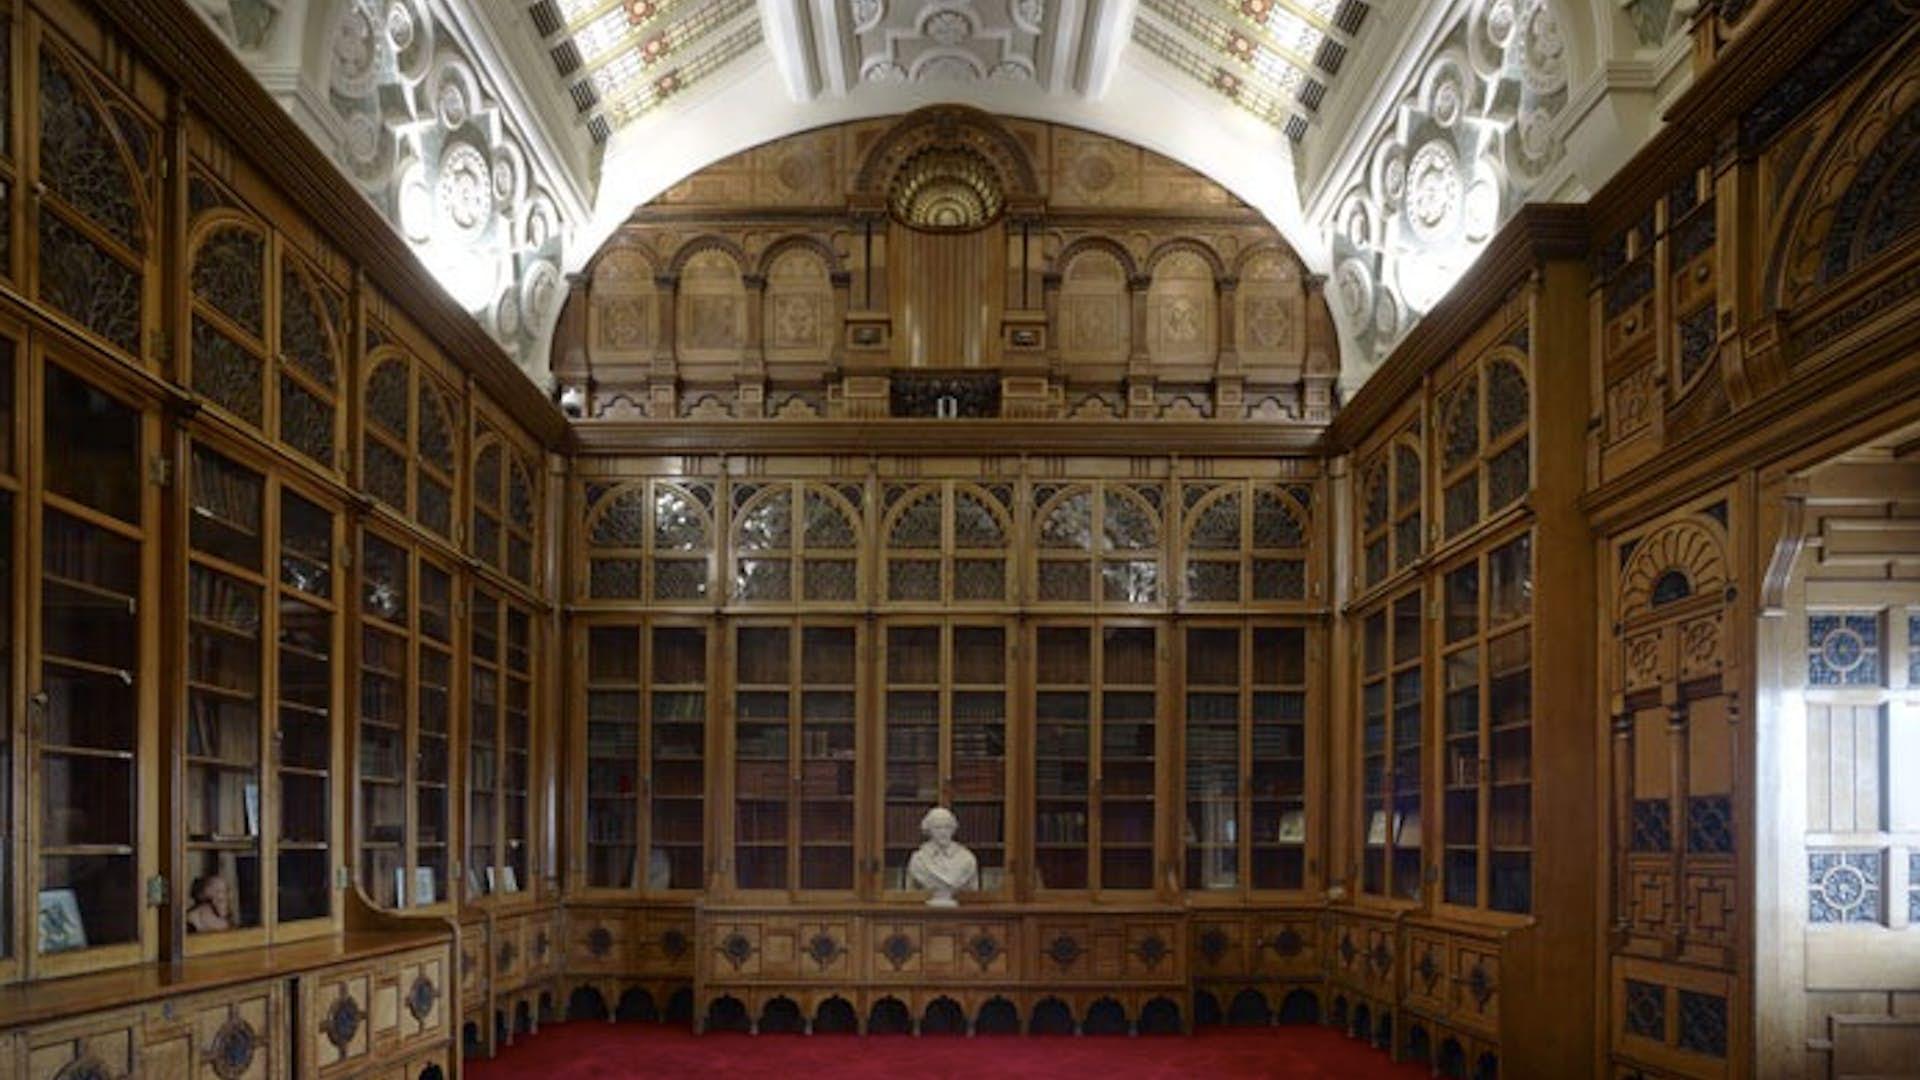 Shakespeare Memorial Room The Library Of Birmingham